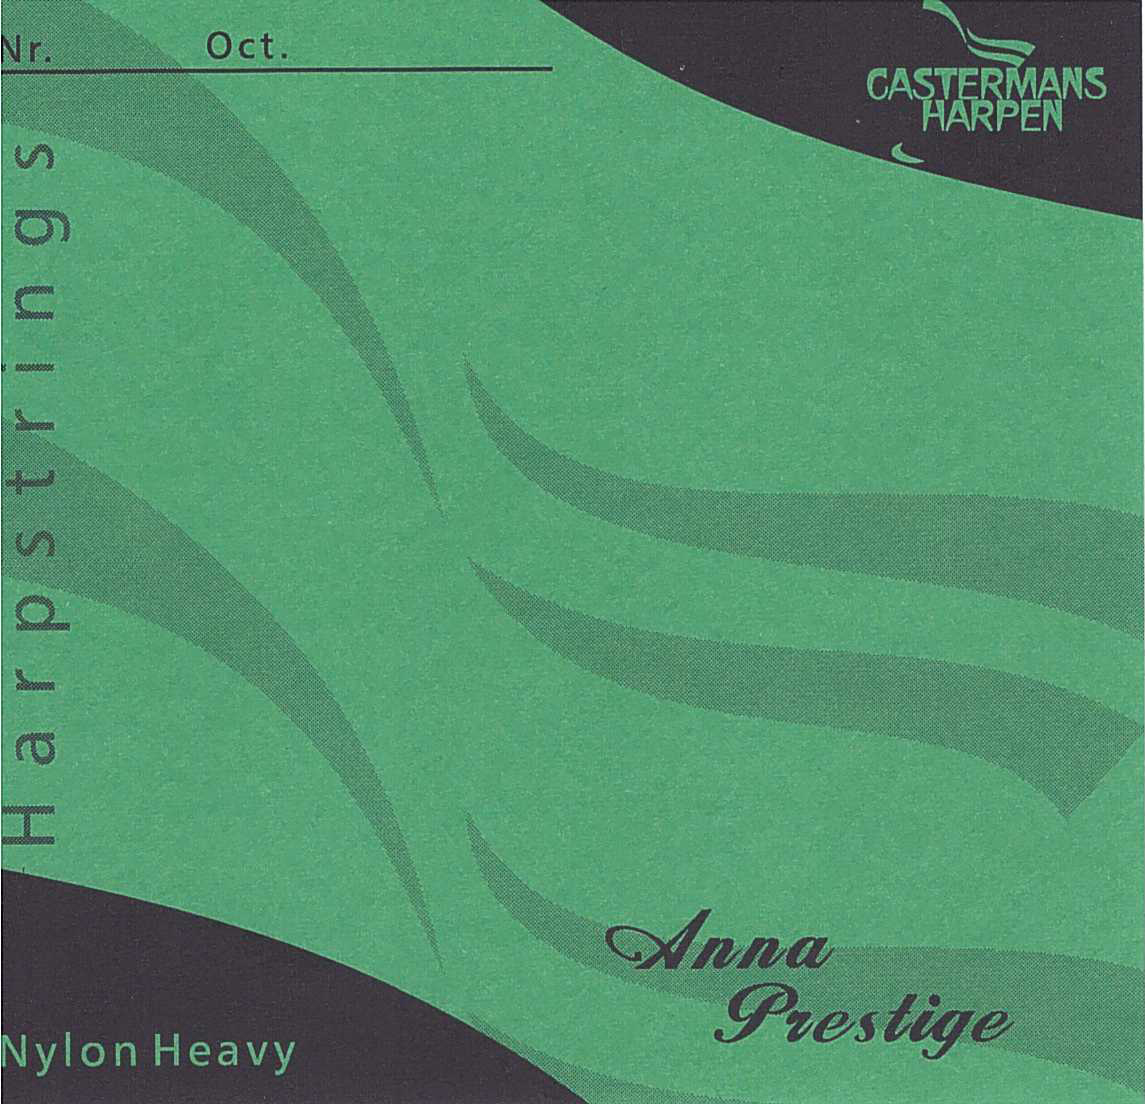 BB nylon heavy (21)